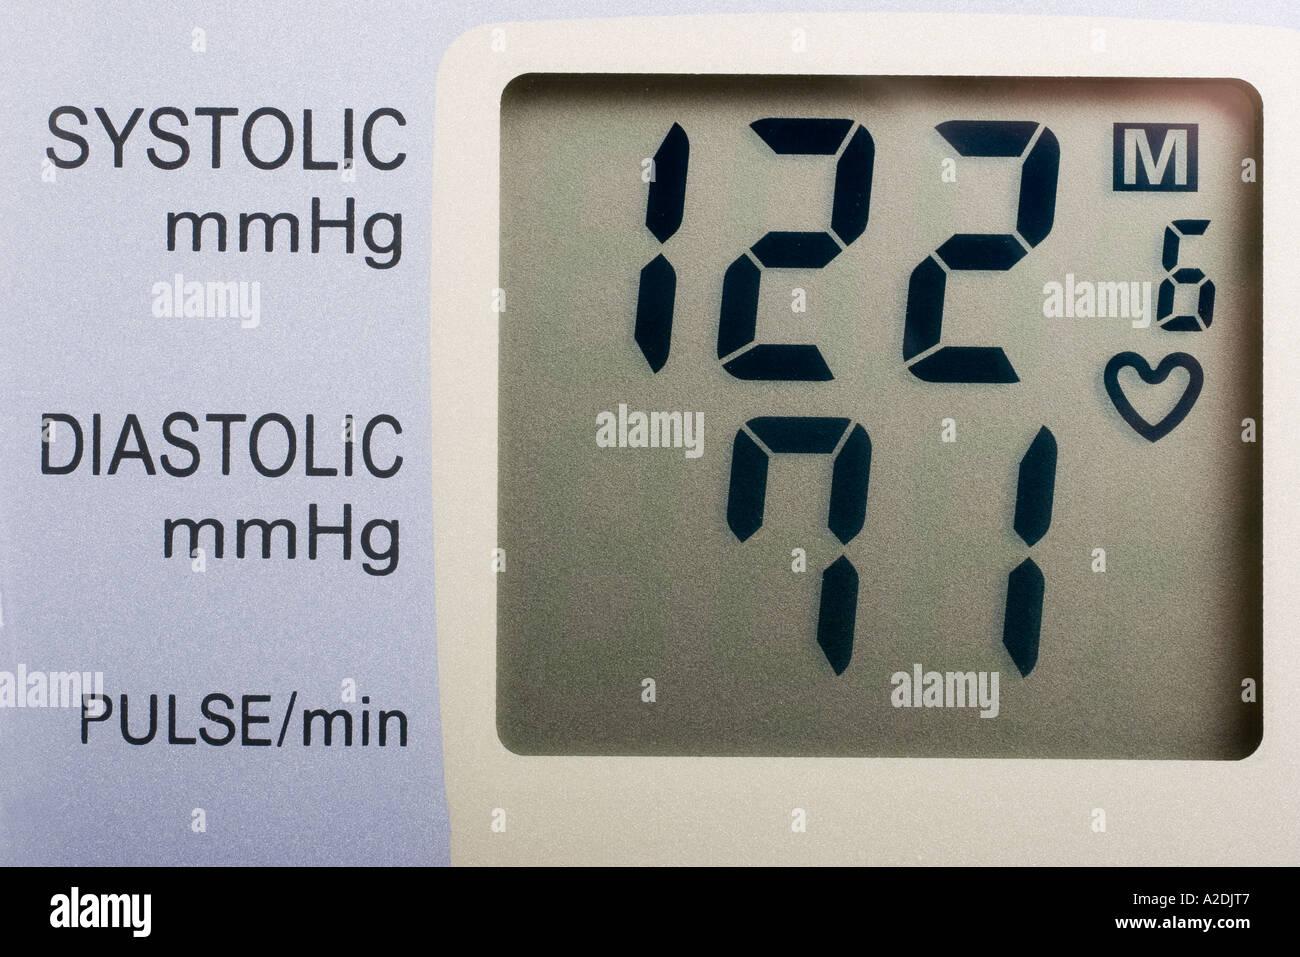 Digital display of a blood pressure monitor showing normal blood digital display of a blood pressure monitor showing normal blood pressure readout nvjuhfo Choice Image